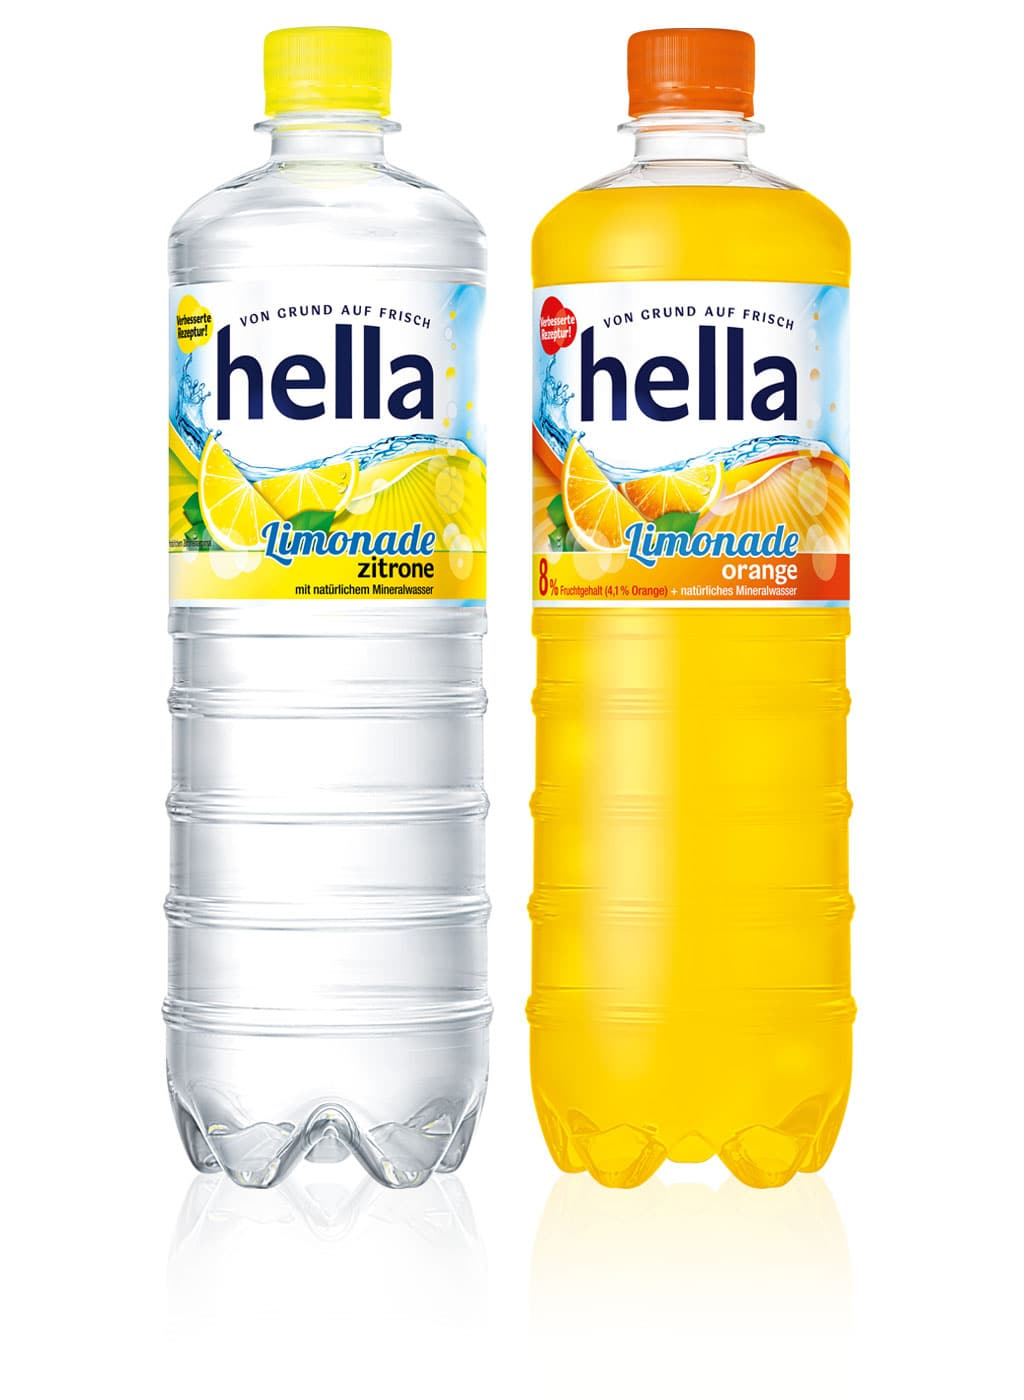 Hella - Getränke - Packaging Design - justblue.design